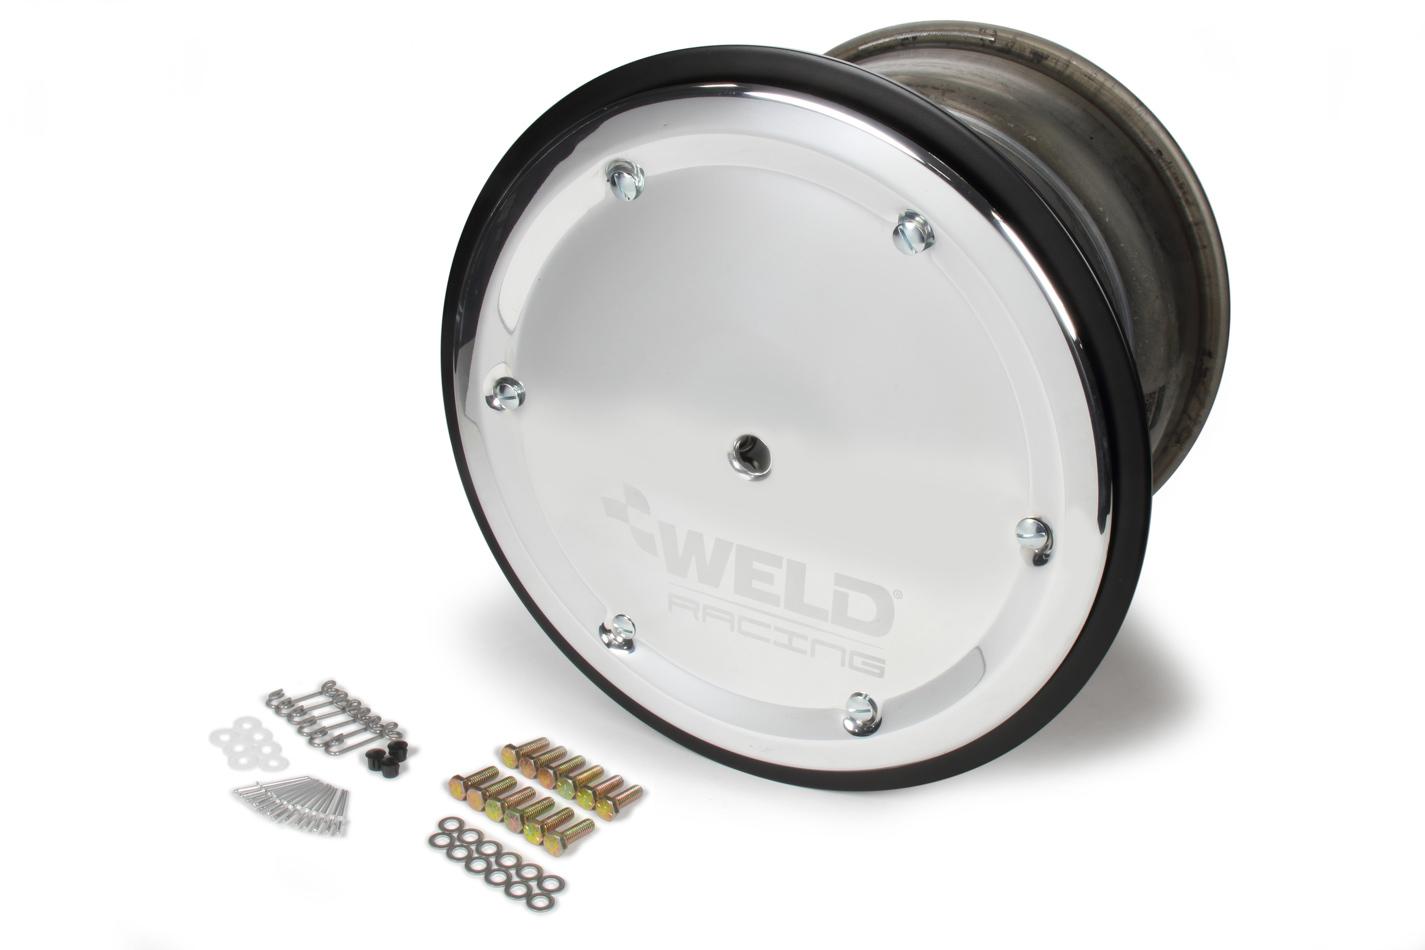 WELD RACING 15 X 13 Wide 5 XL 5in BS Bead-Loc w/Cover P/N -559-5355M-6